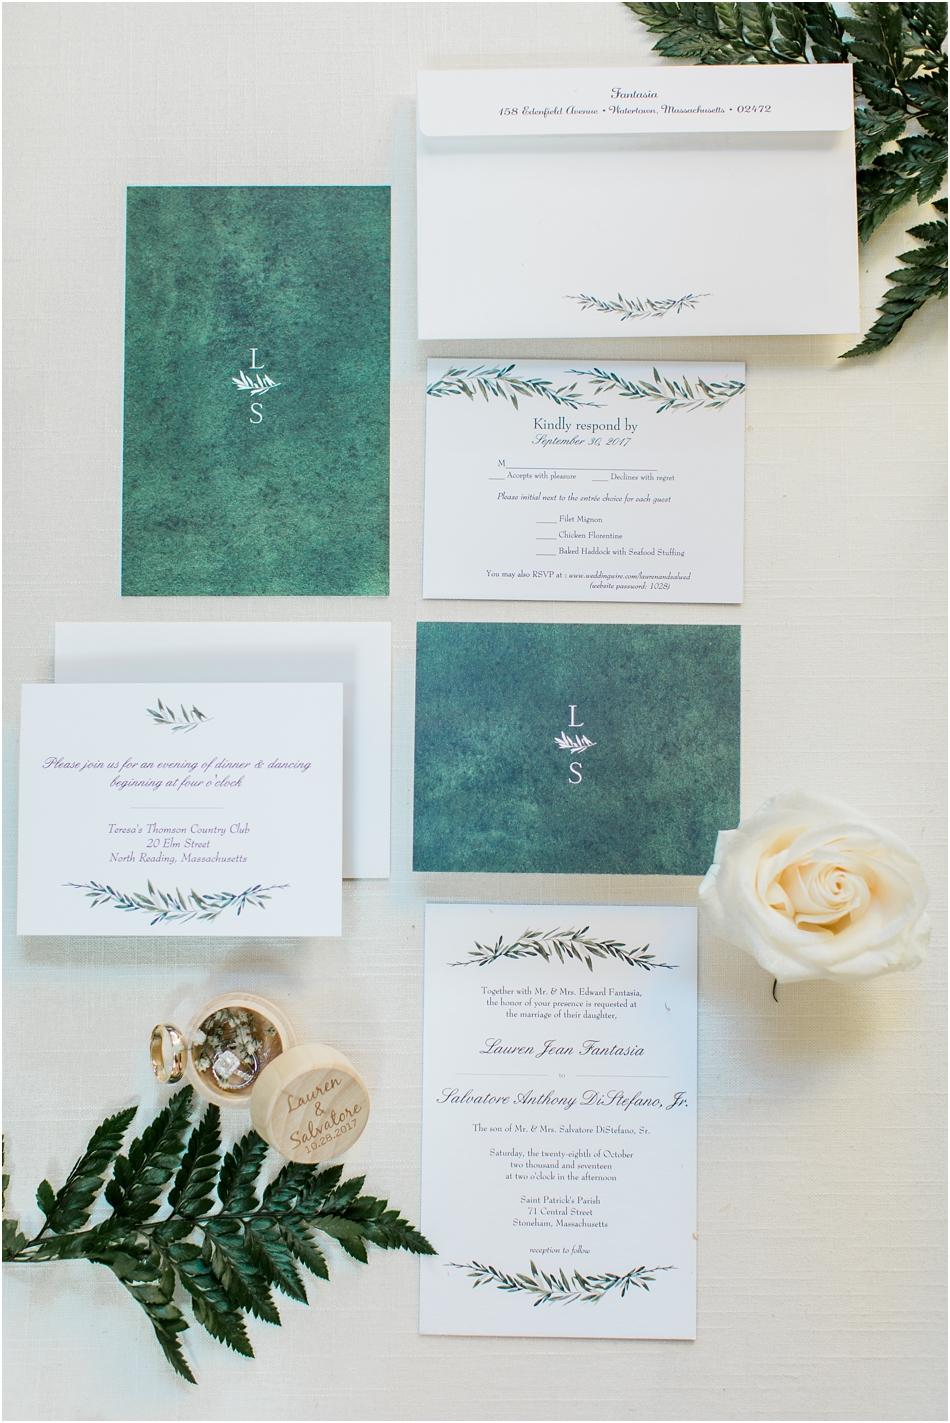 north_reading_lauren_sal_ballroom_cape_cod_boston_new_england_wedding_photographer_Meredith_Jane_Photography_photo_0099.jpg